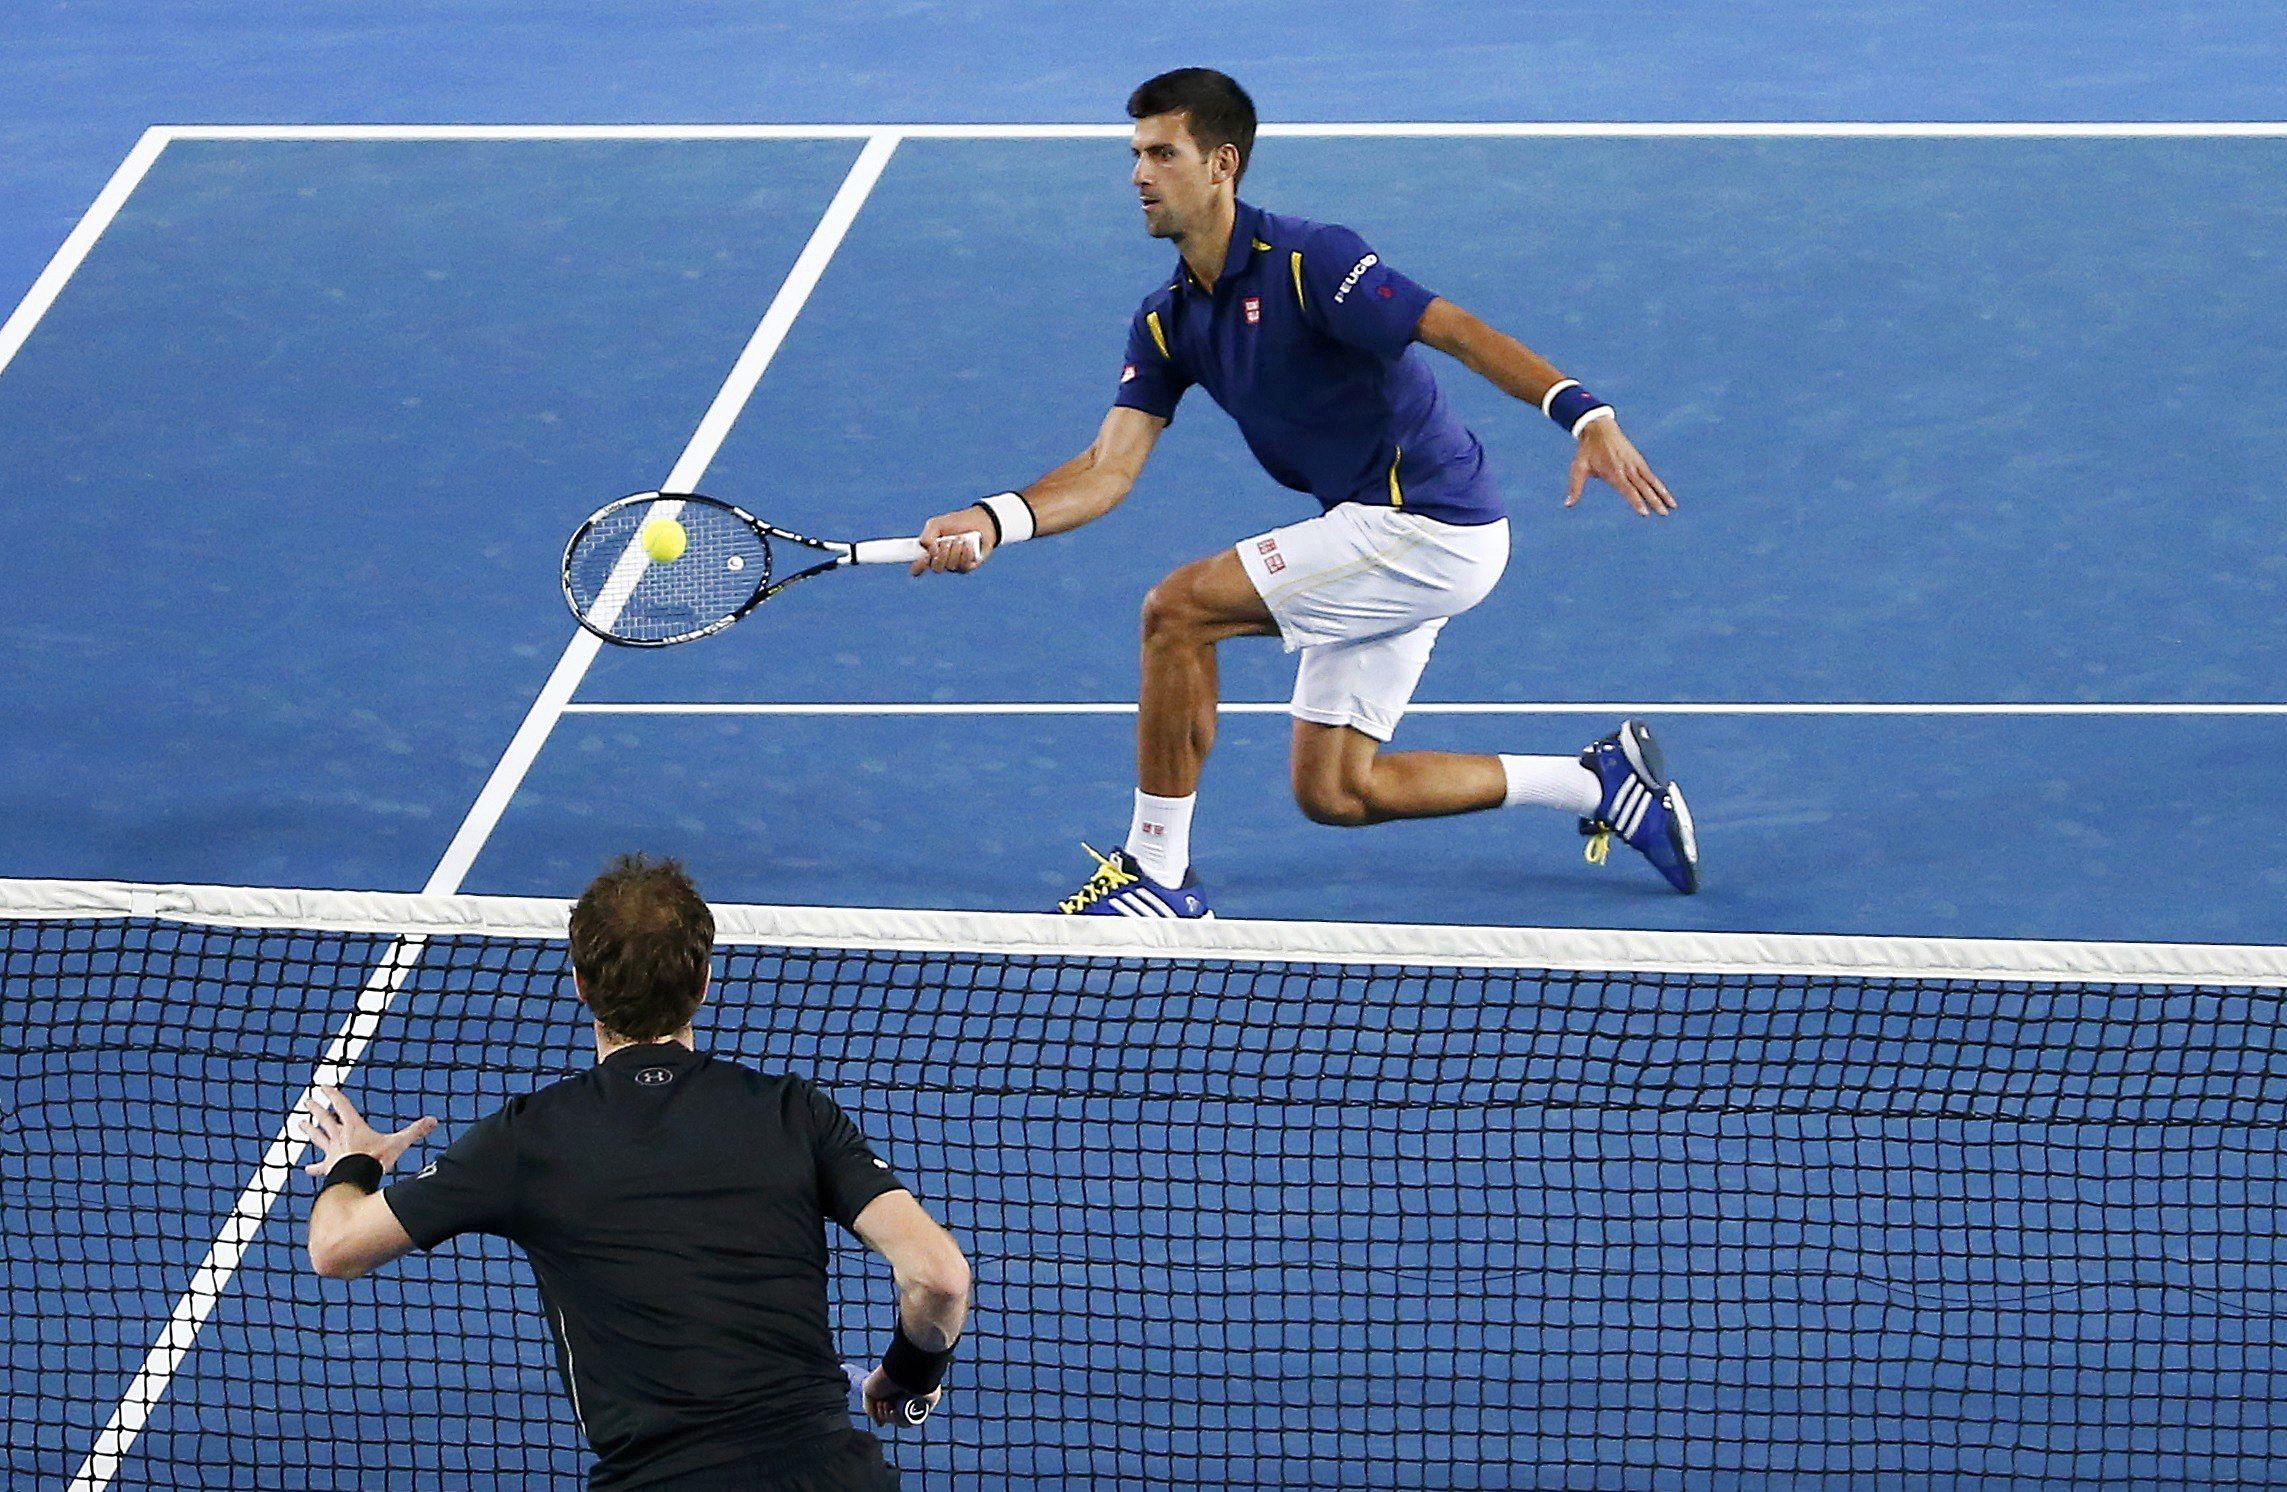 Australian Open Final Murray vs Djokovic